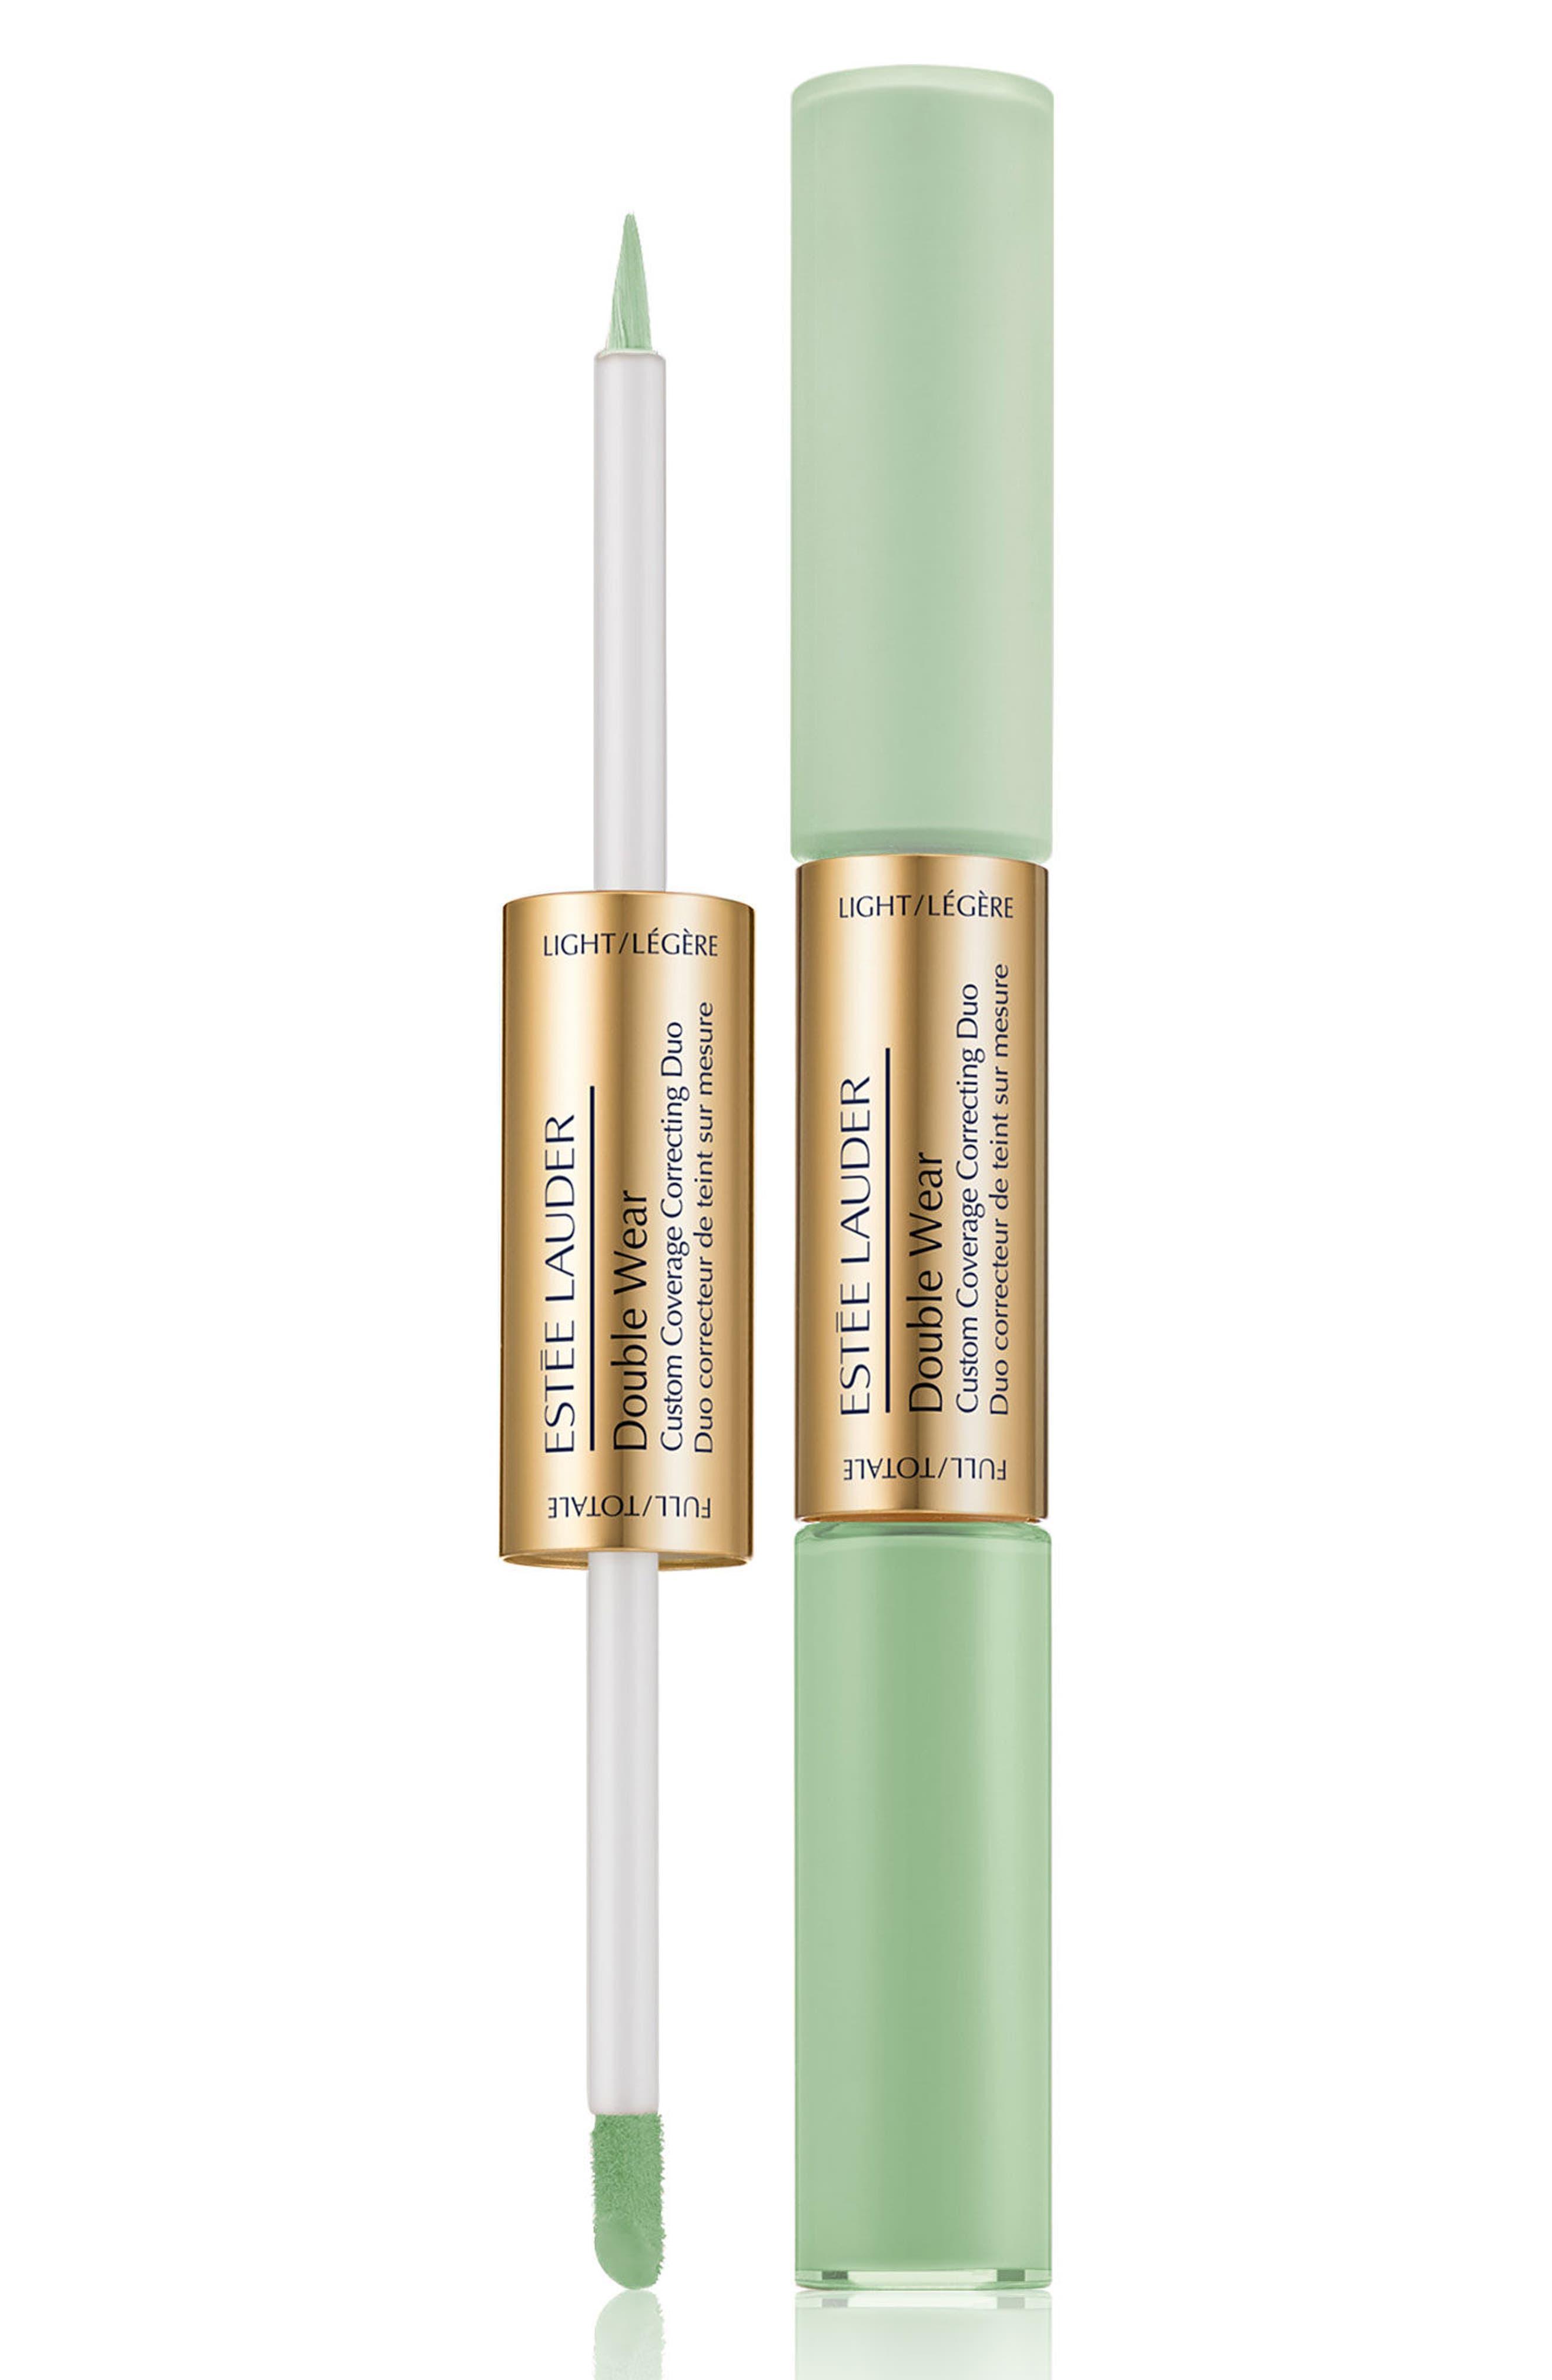 Estee Lauder Double Wear Custom Coverage Correcting Duo - Green